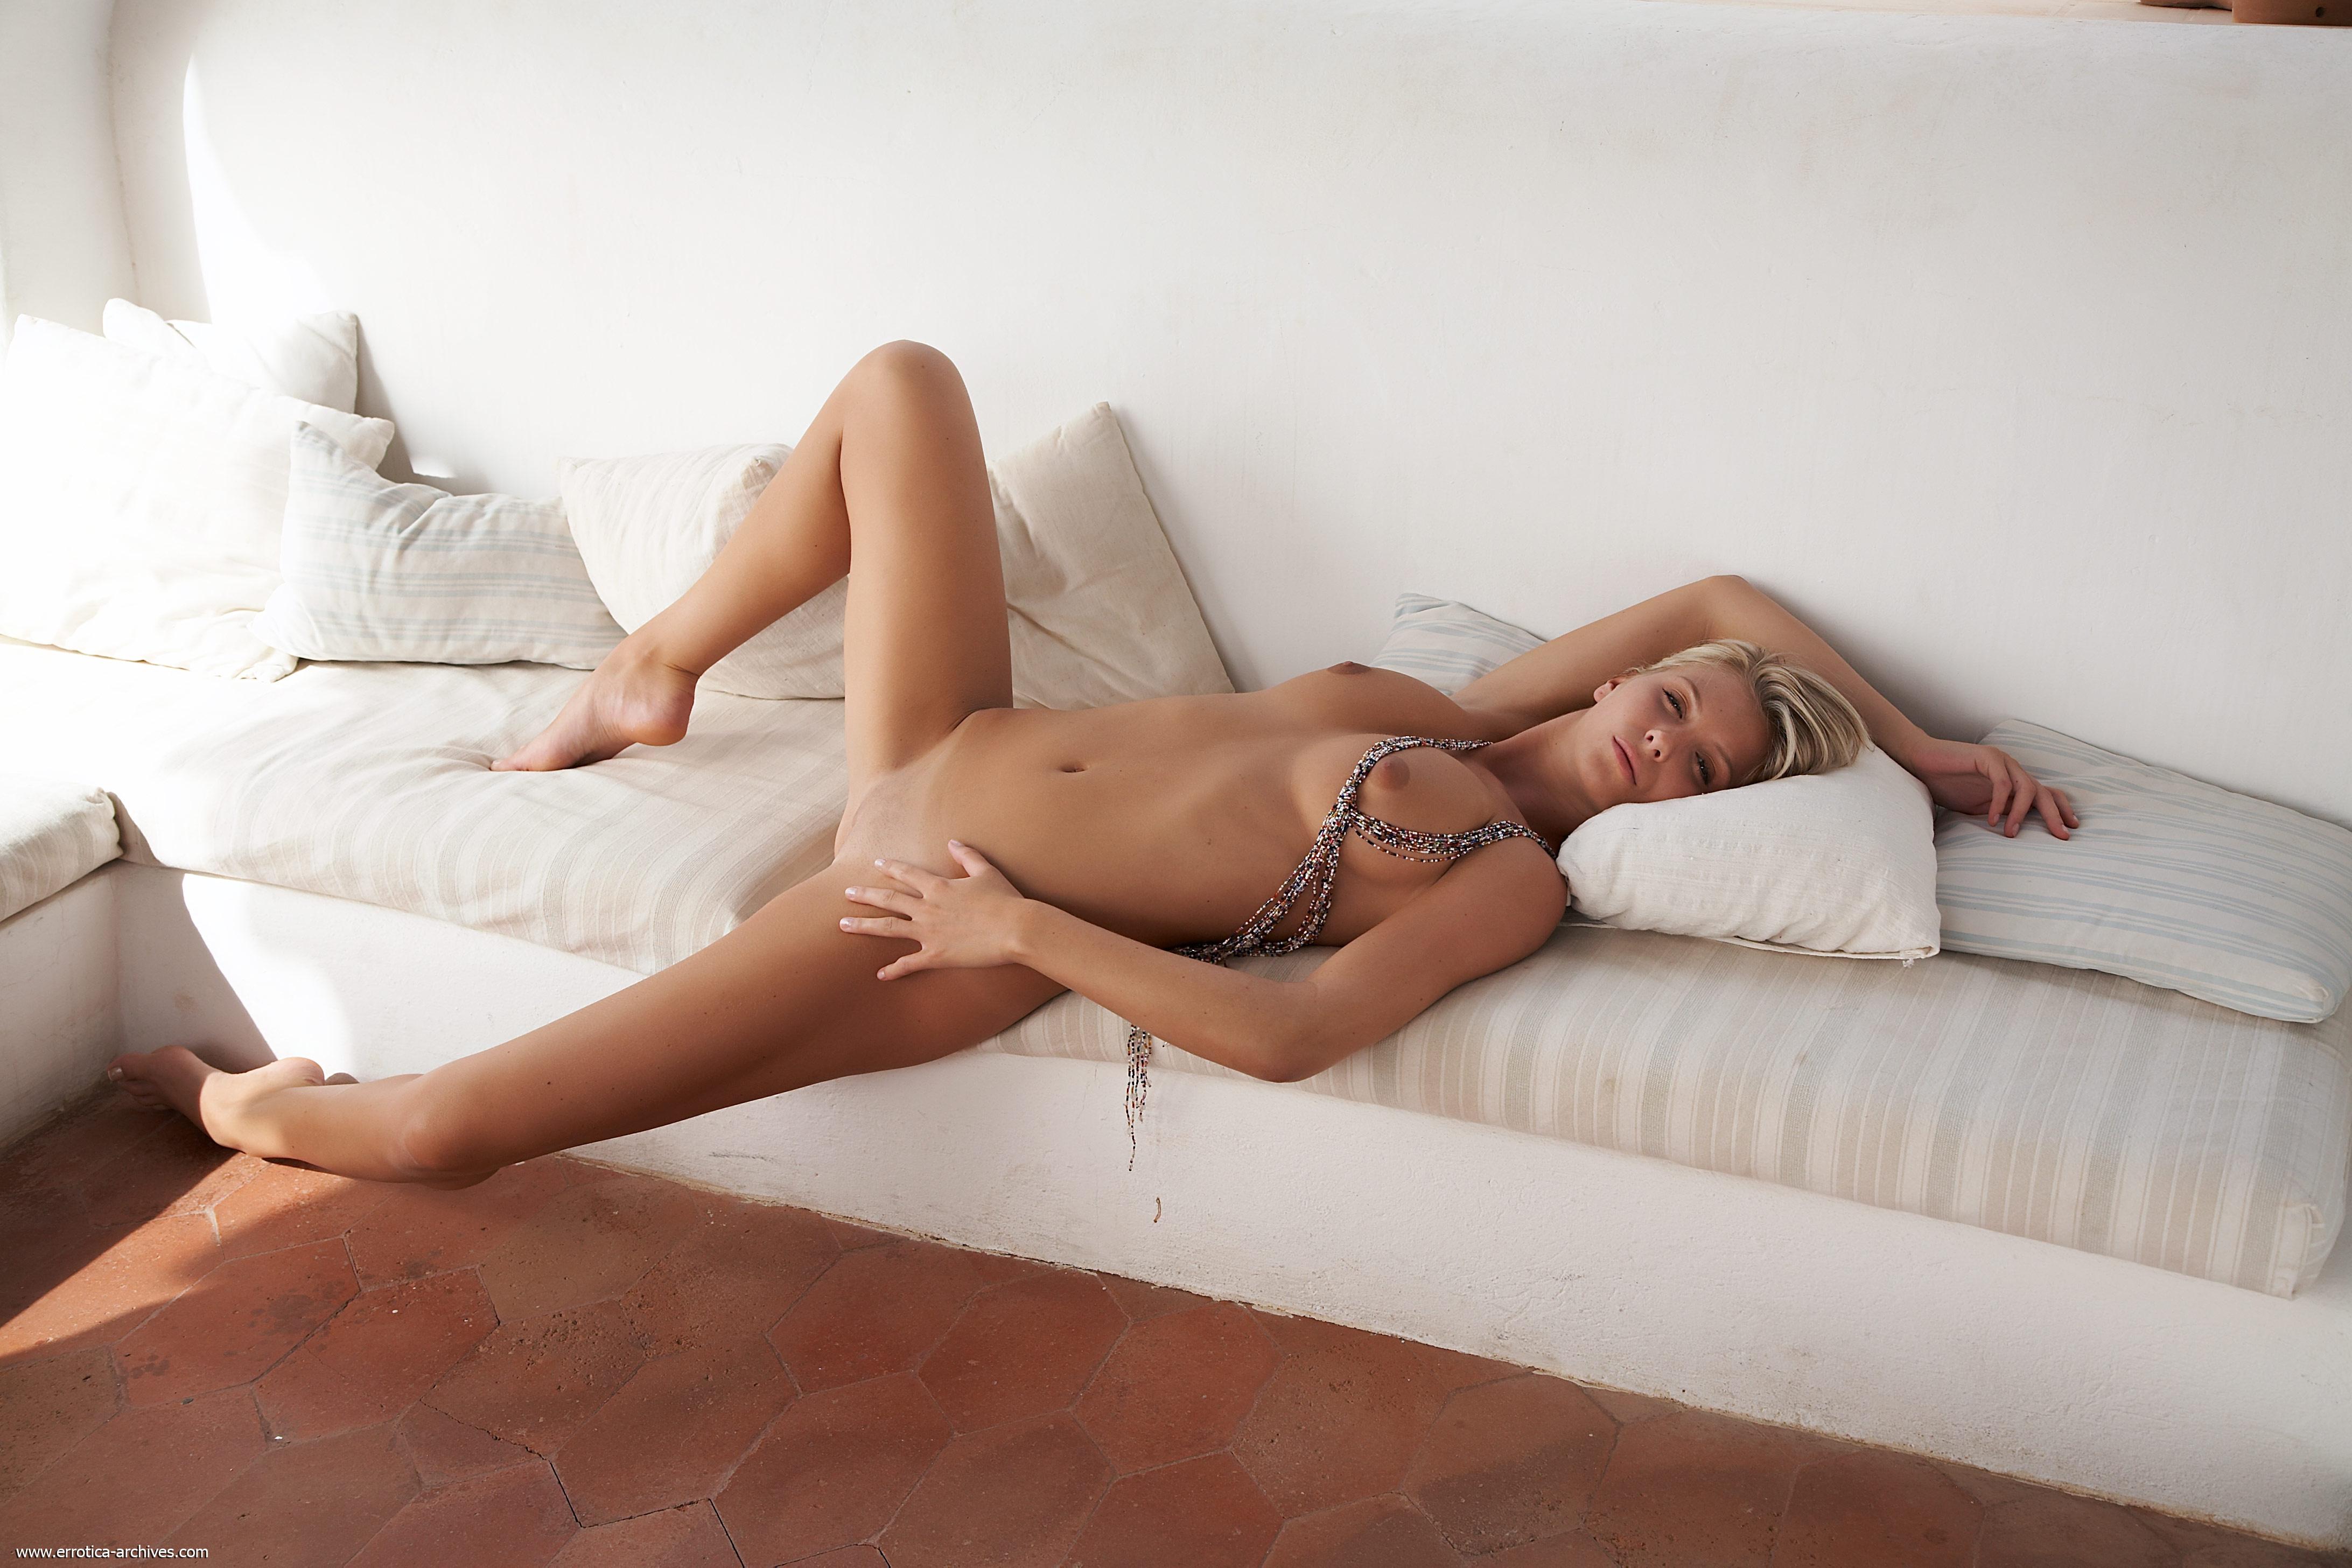 Wallpaper Danae, Blonde, Czech Girl, Hires, Solo, Sofa -2679